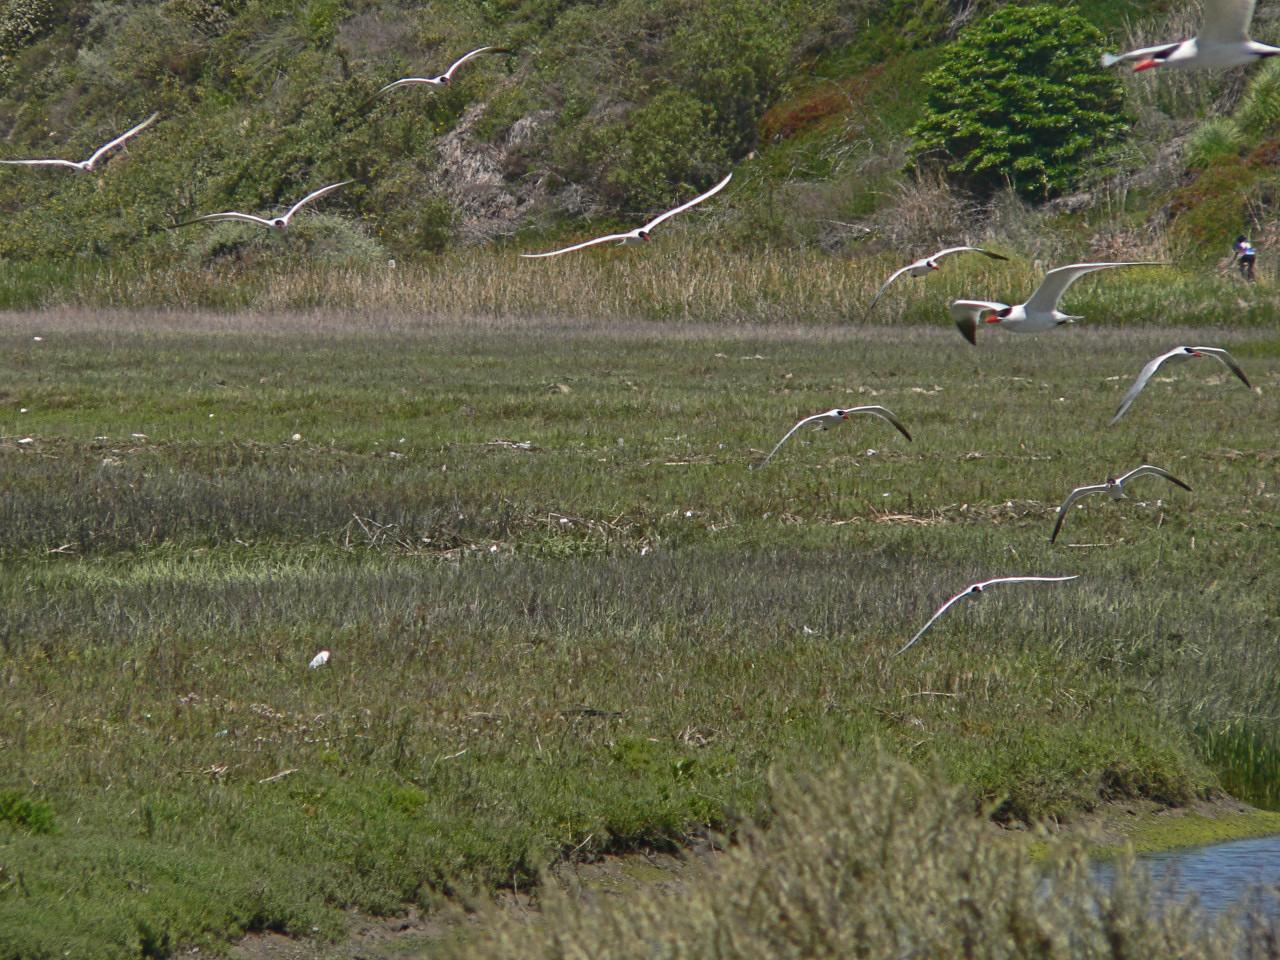 Caspian Terns Incoming